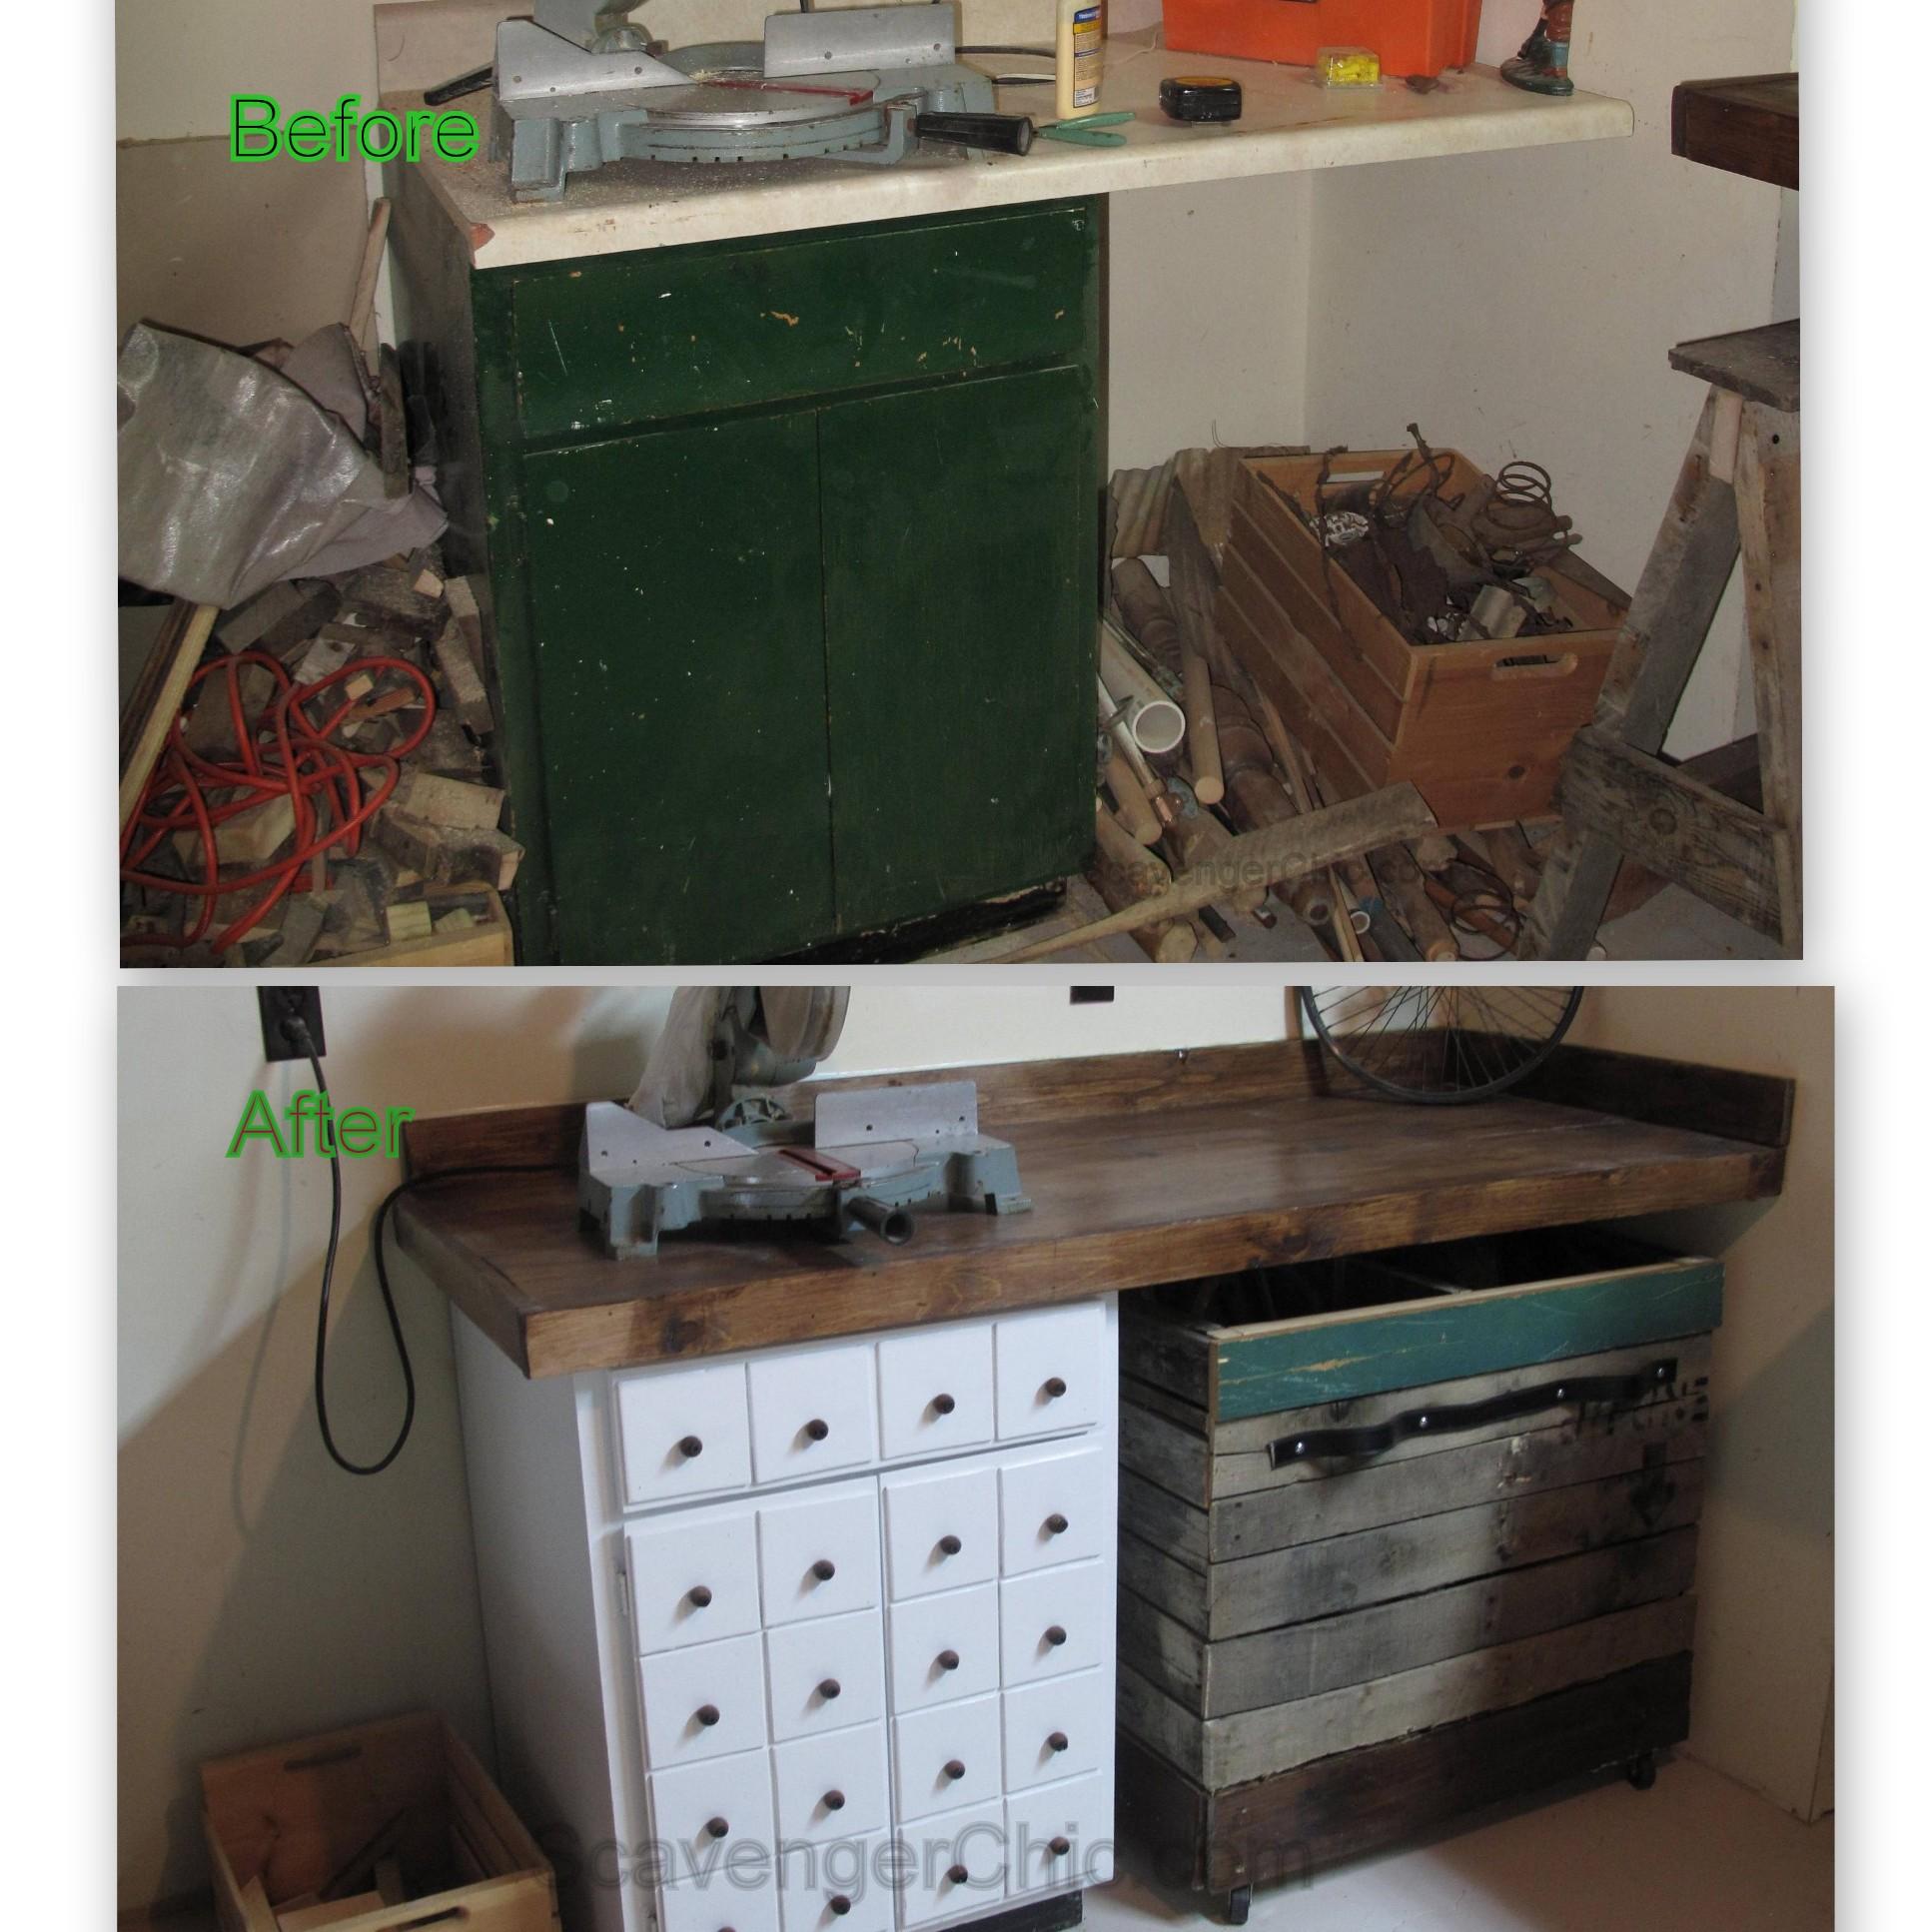 Workshop Cabinets Diy Faux Apothecary Cabinet Workshop Storage Scavenger Chic